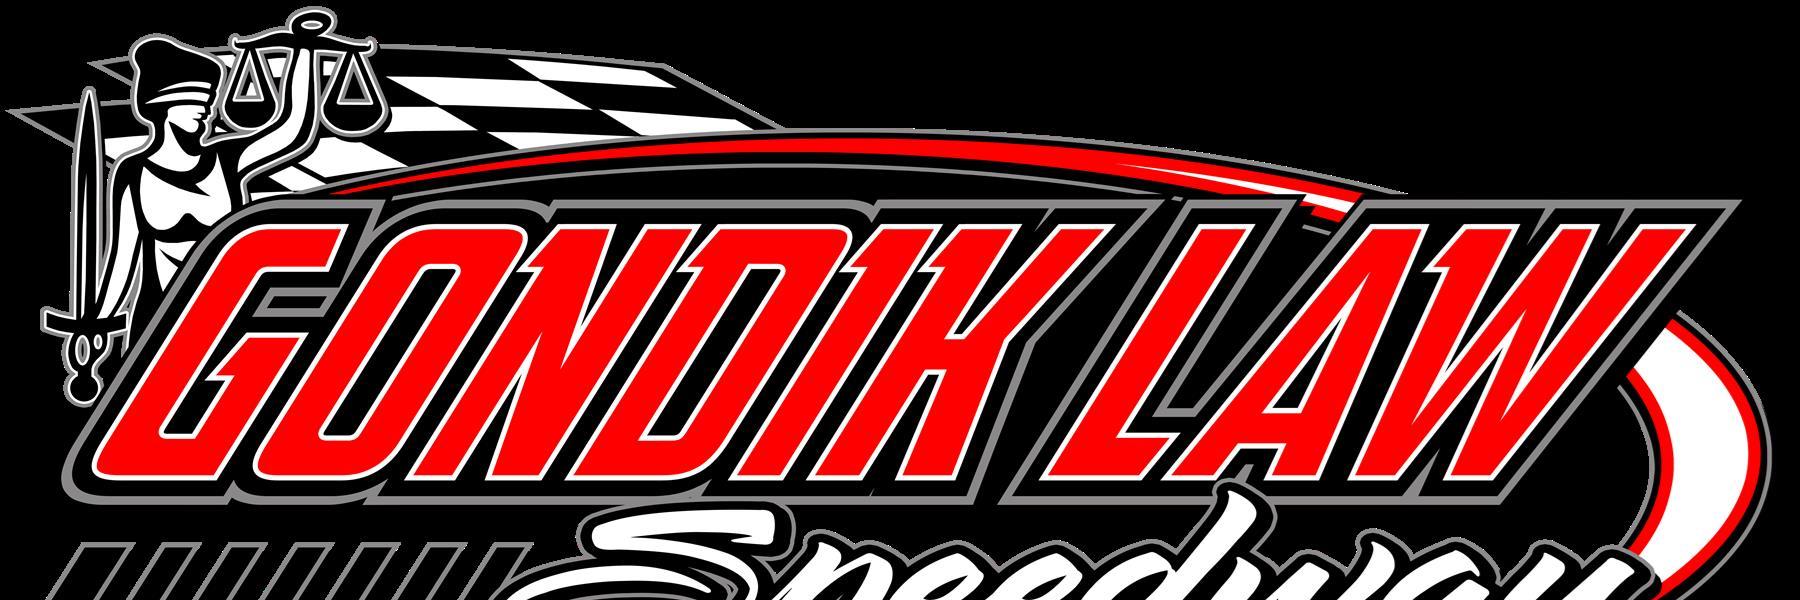 10/15/2021 - Gondik Law Speedway